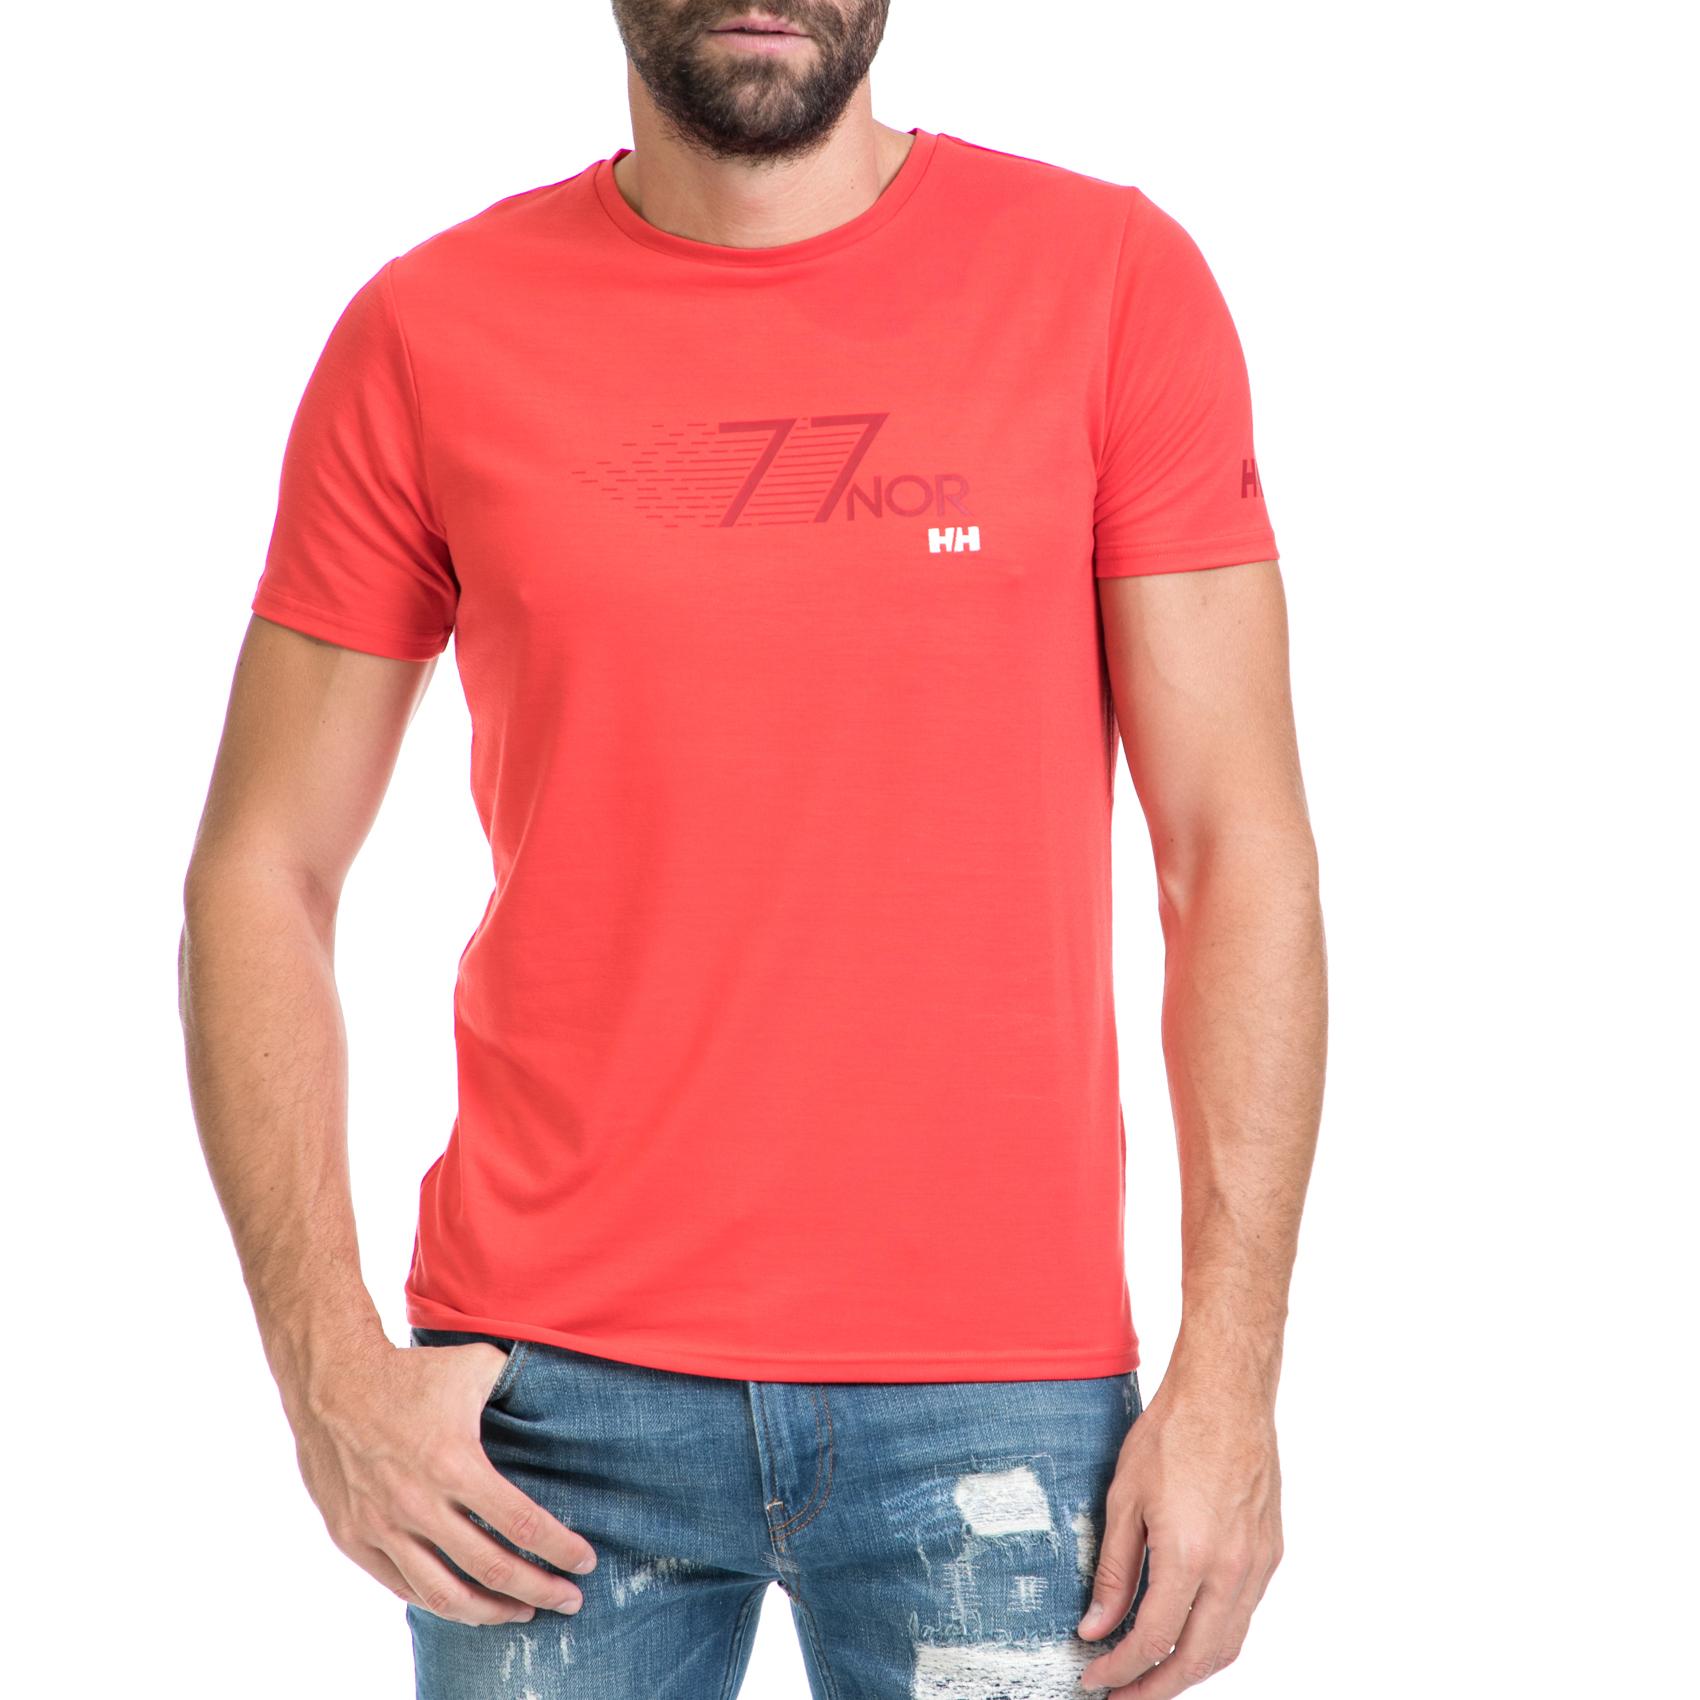 HELLY HANSEN - Ανδρική μπλούζα SHORE κόκκινη-πορτοκαλί ανδρικά ρούχα αθλητικά t shirt